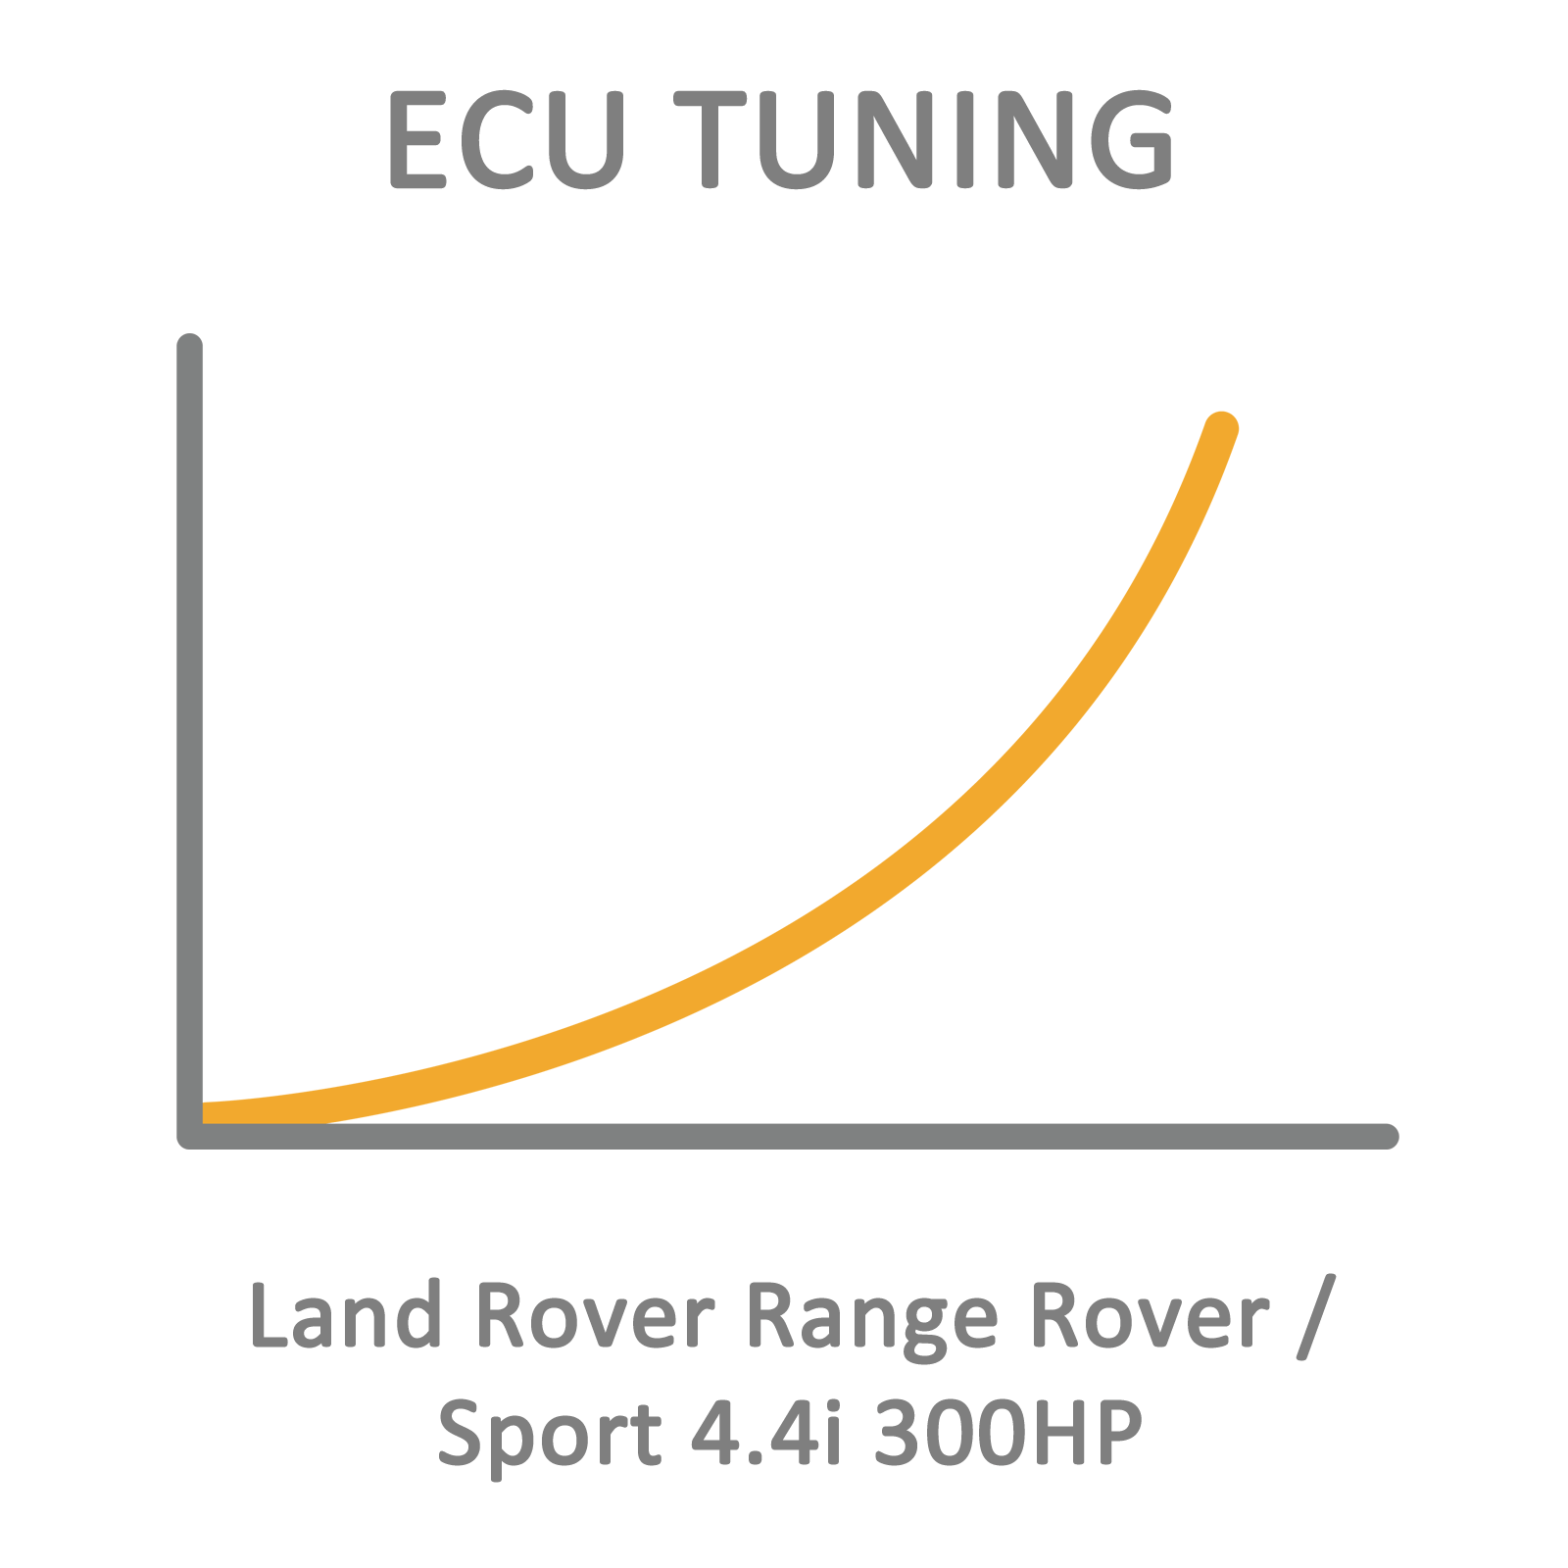 Land Rover Range Rover / Sport 4.4i 300HP ECU Tuning